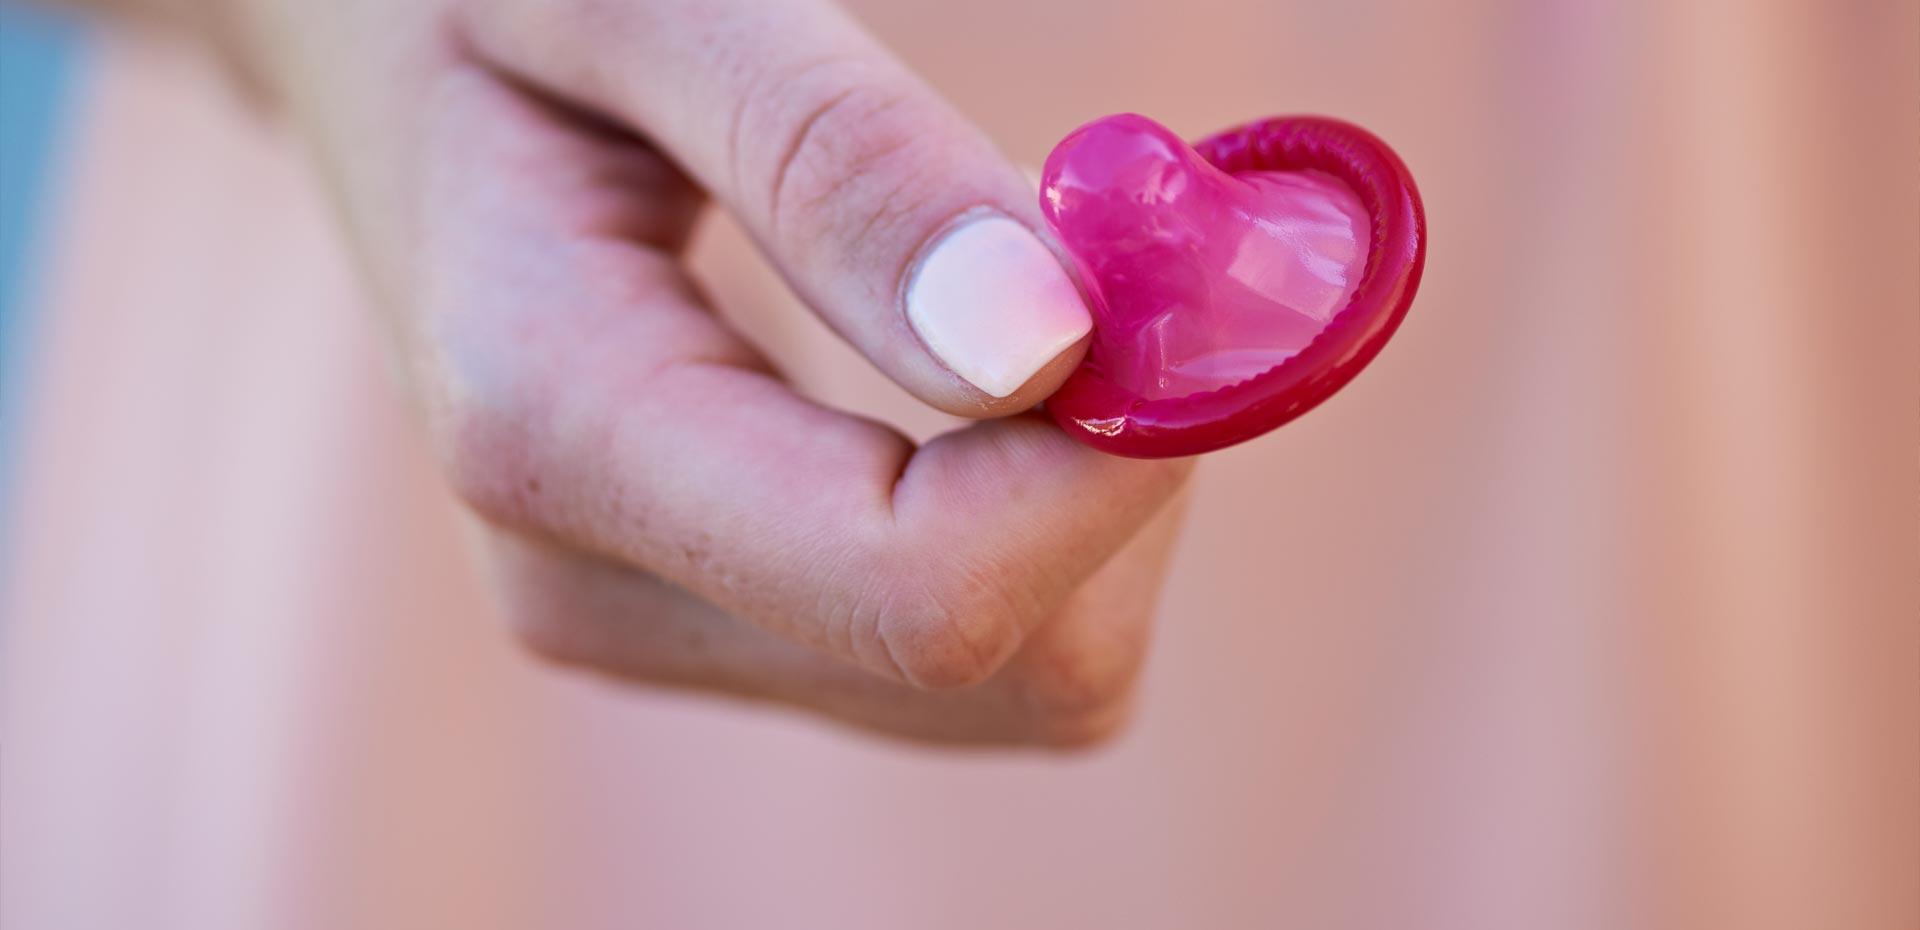 Frauenhand mit rosa Kondom